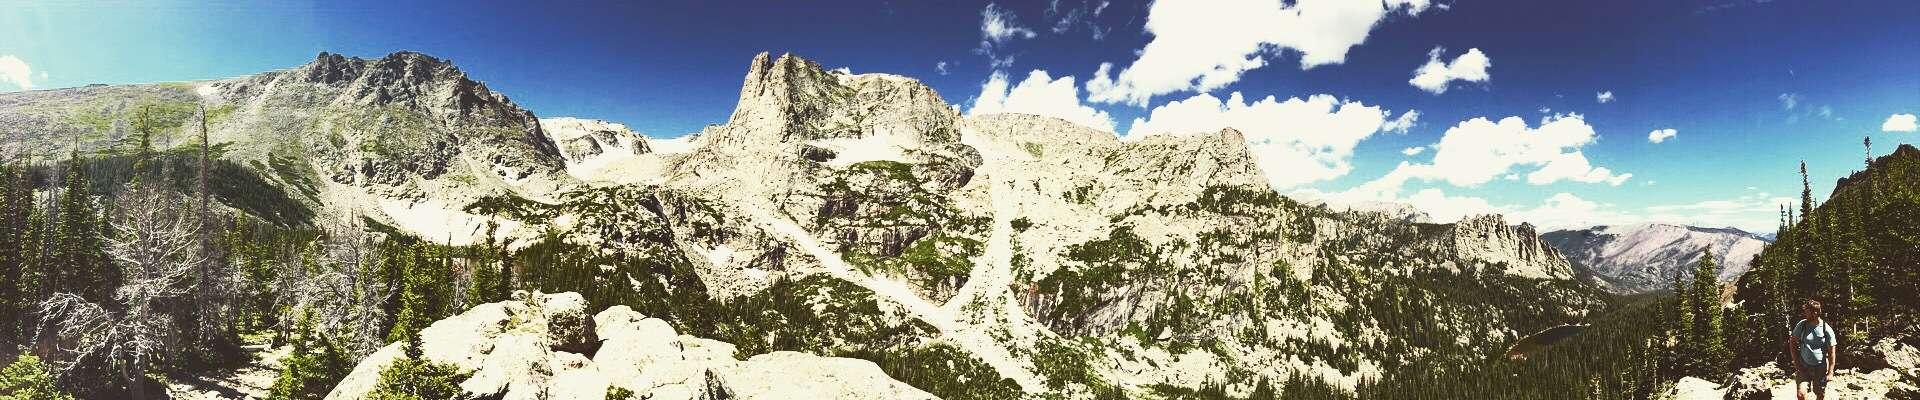 super bowl showdown rocky mountains